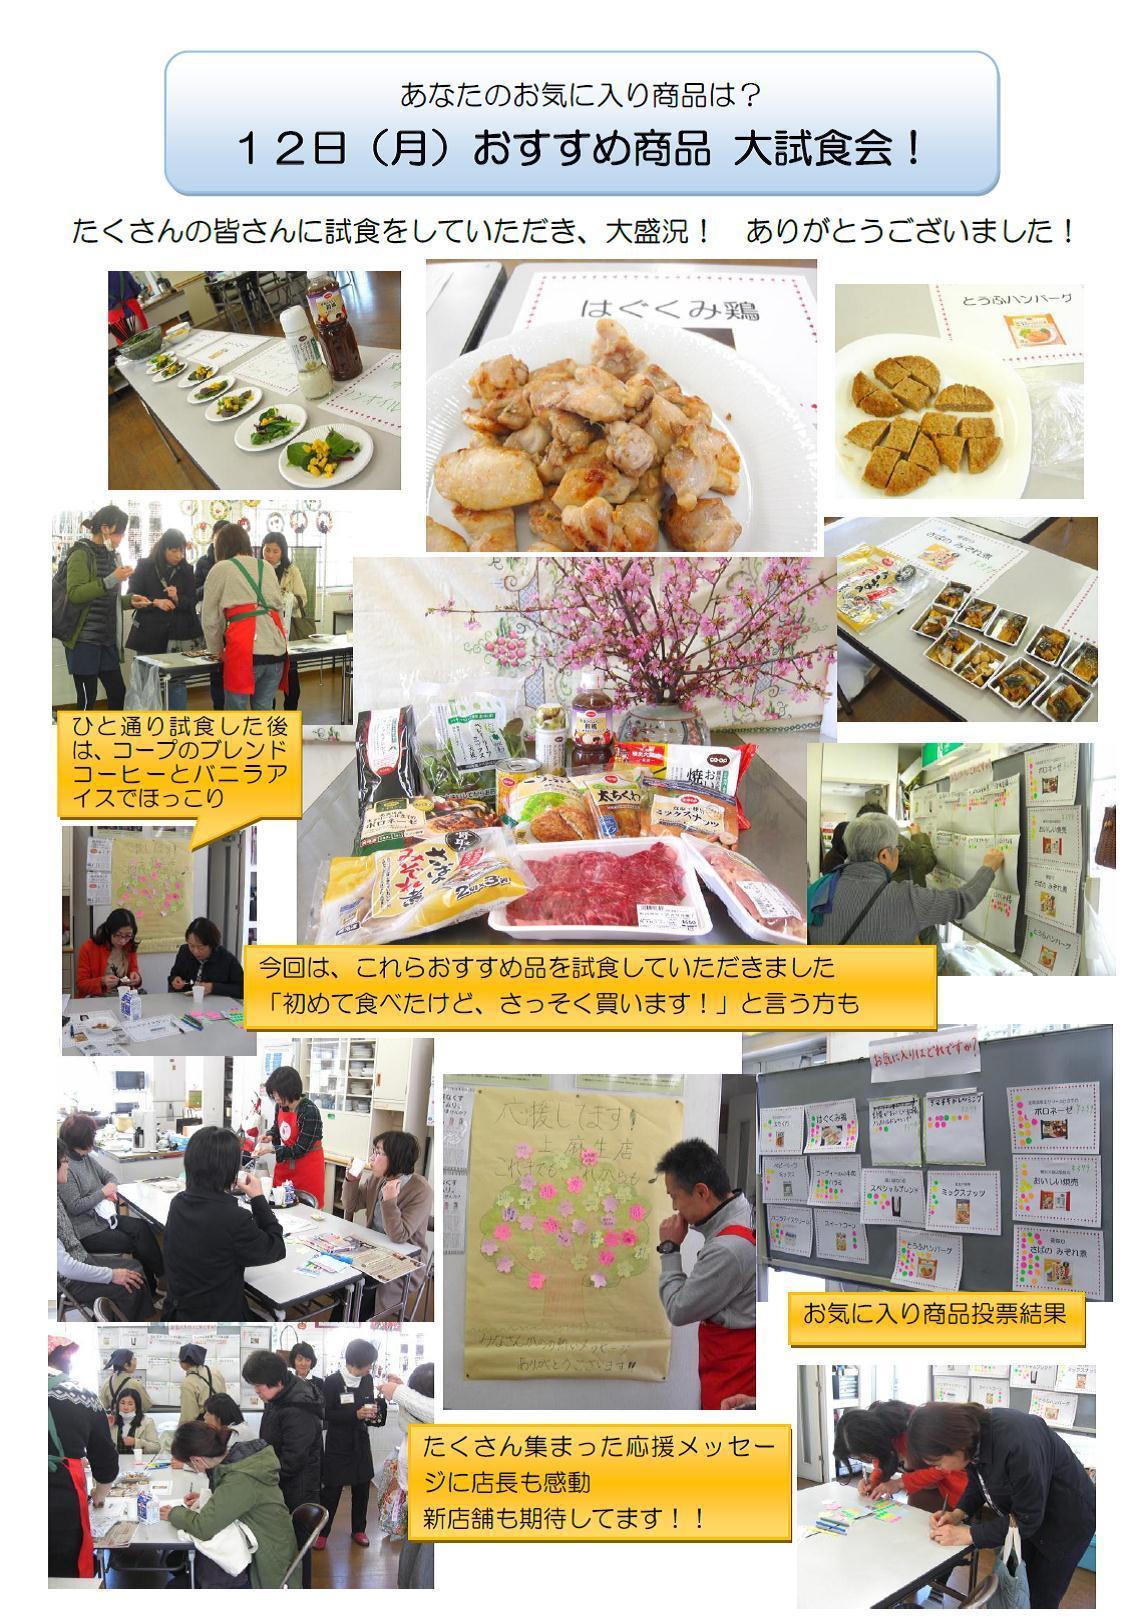 http://kanagawa.ucoop.or.jp/hiroba/areanews/files/18kawasaki2coopfesuta2.jpg